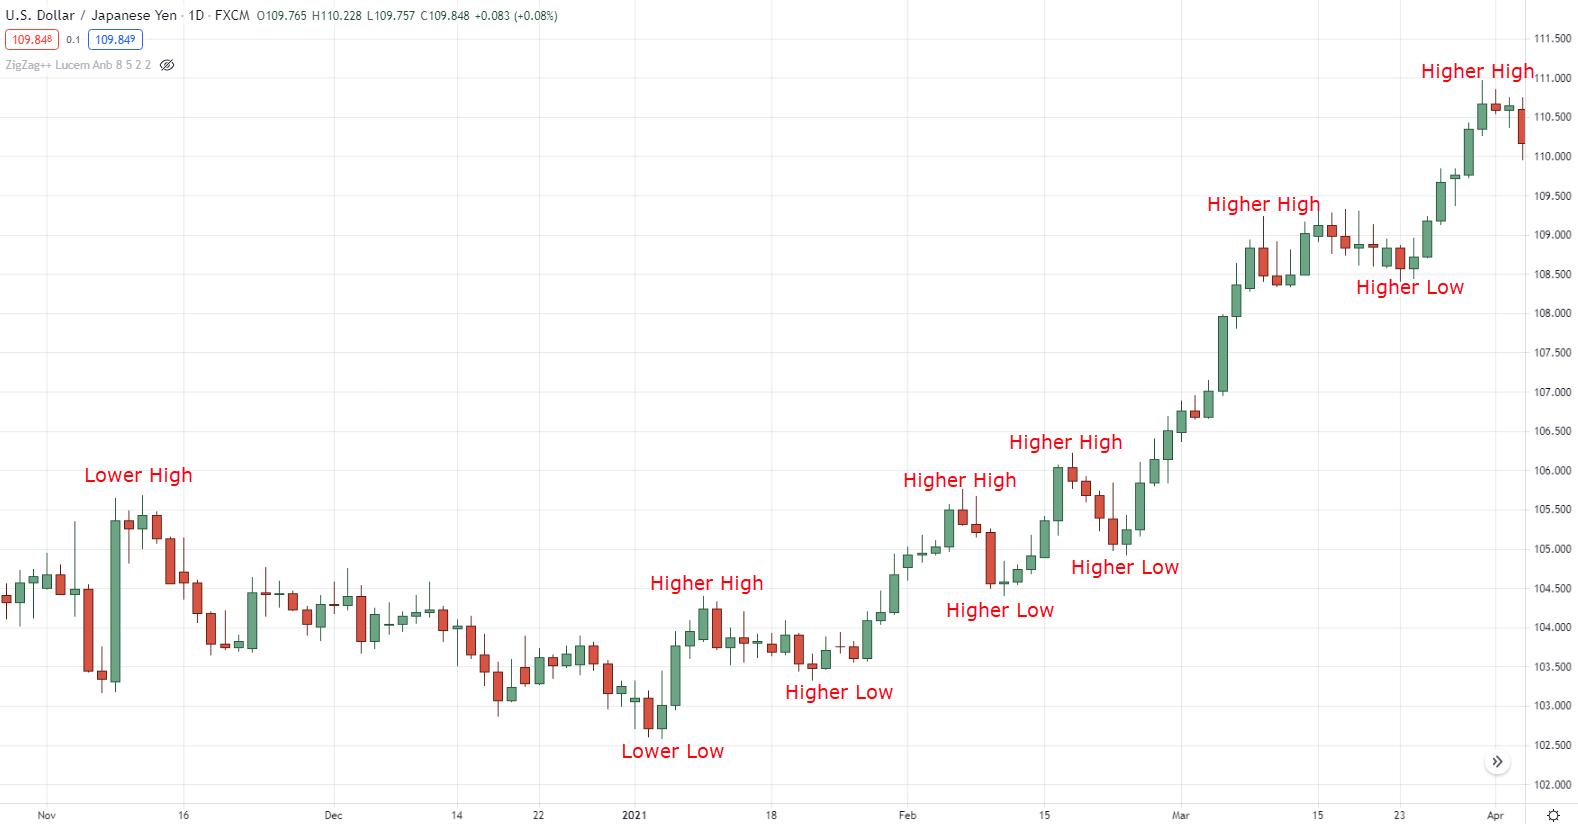 best indicators for swing trading,swing trading indicators,swing trading